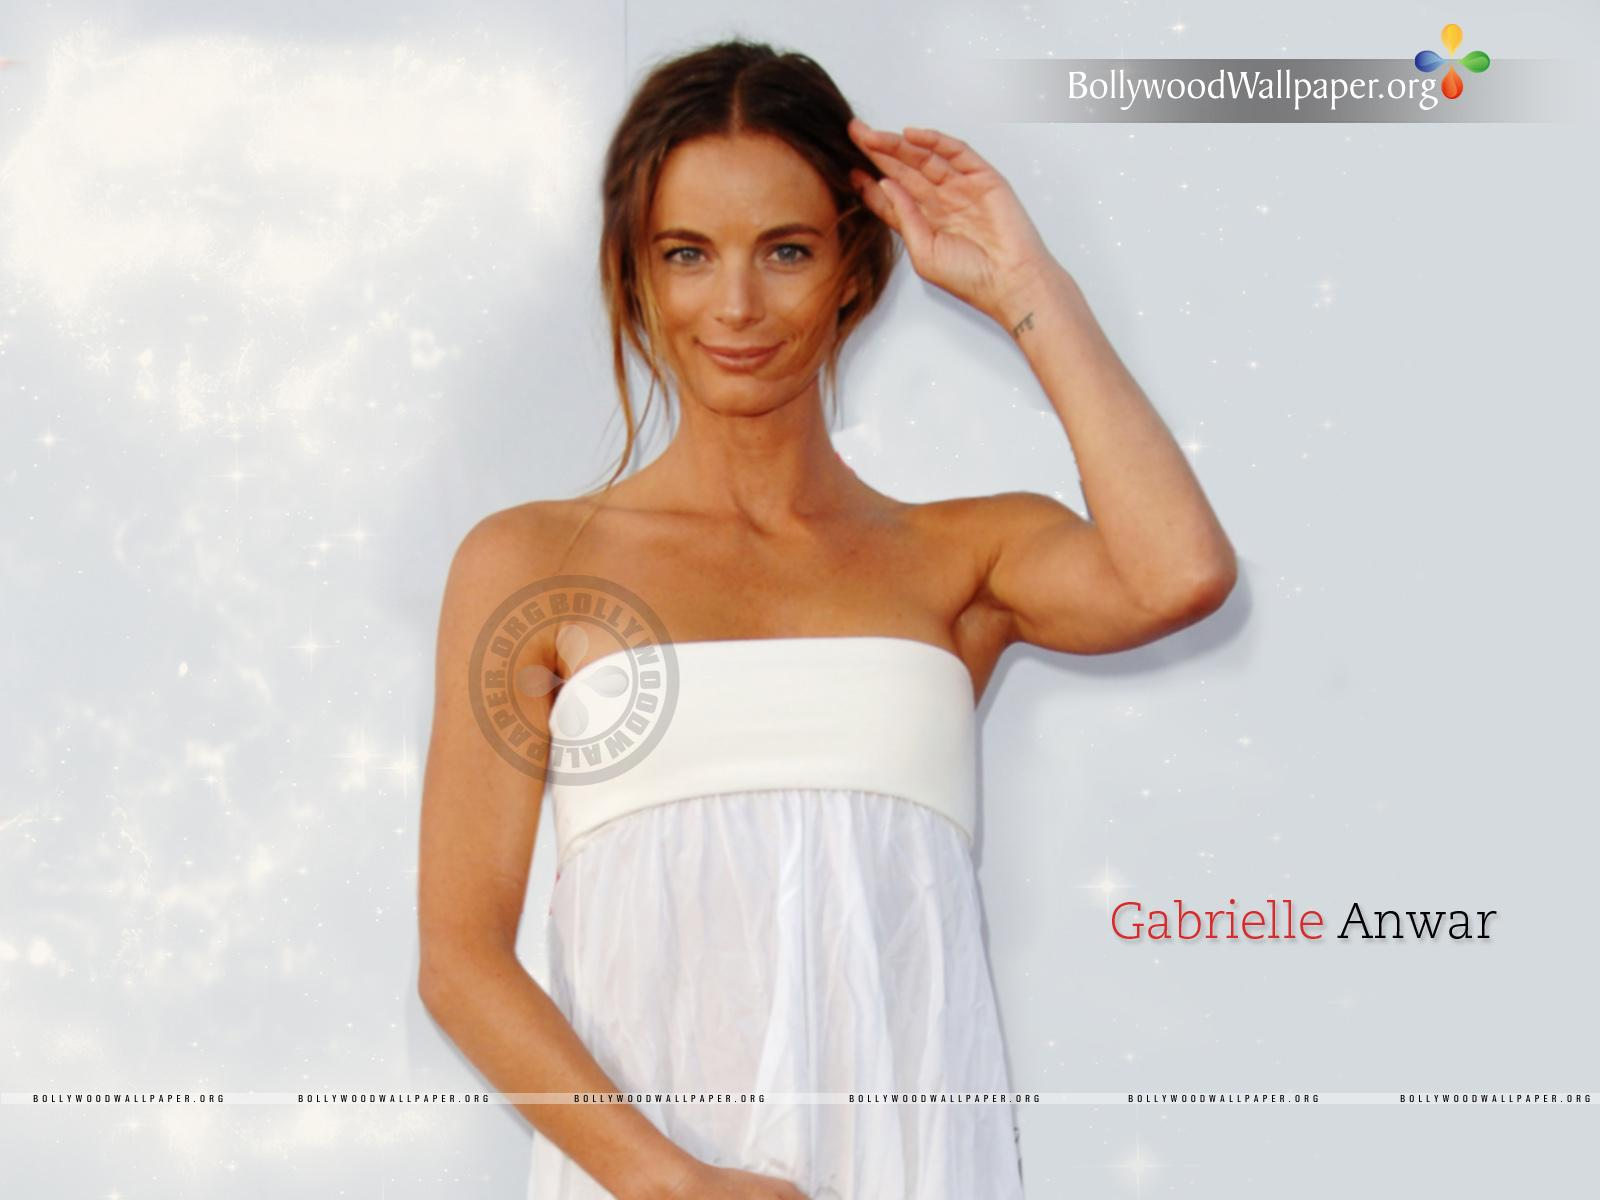 Gabrielle Anwar   The Tudors Cast Wallpaper 29861115 1600x1200